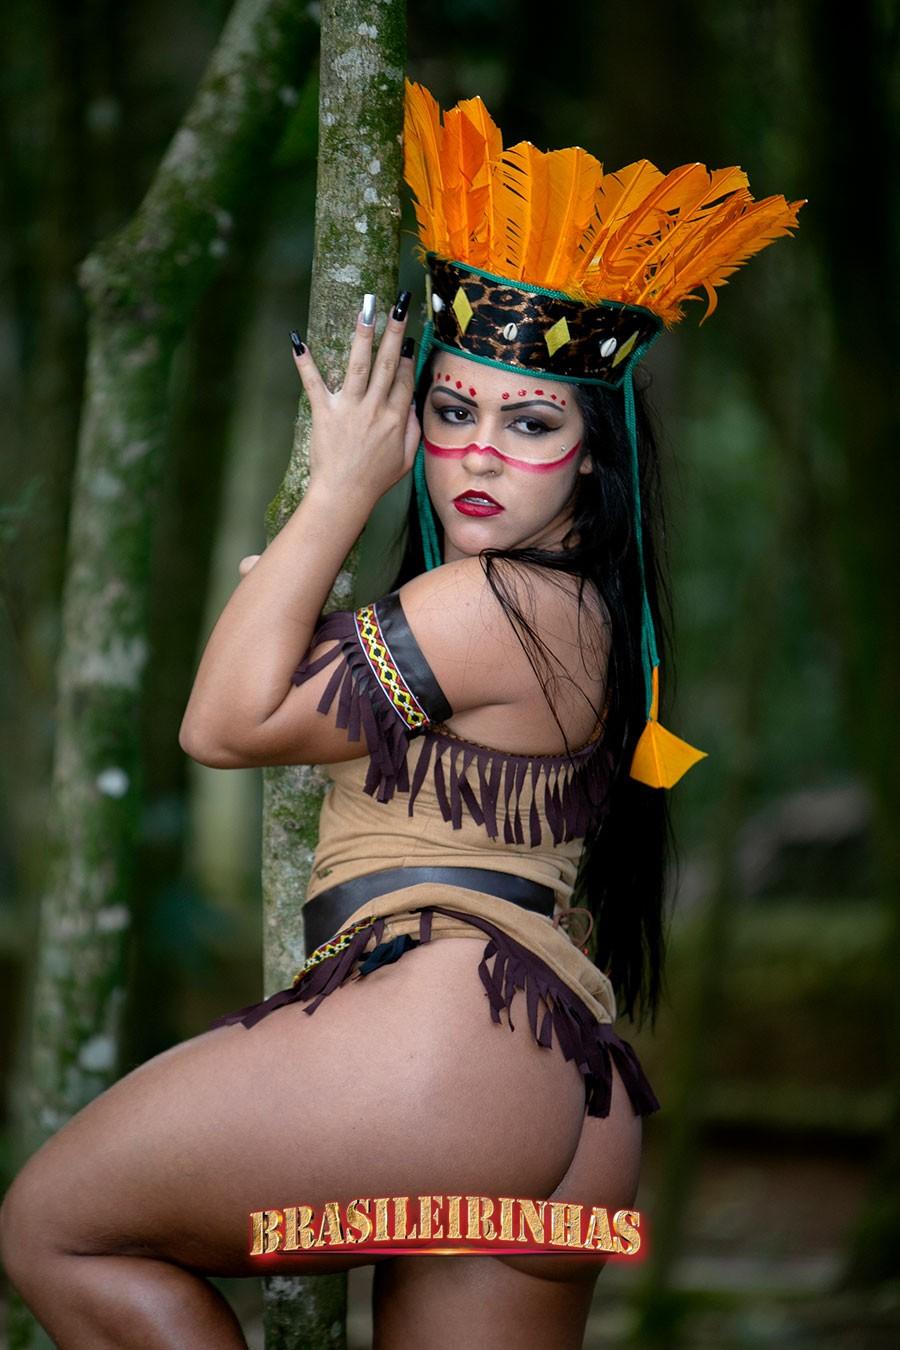 Rebecca-Santos-agarrando-a-arvore.jpg